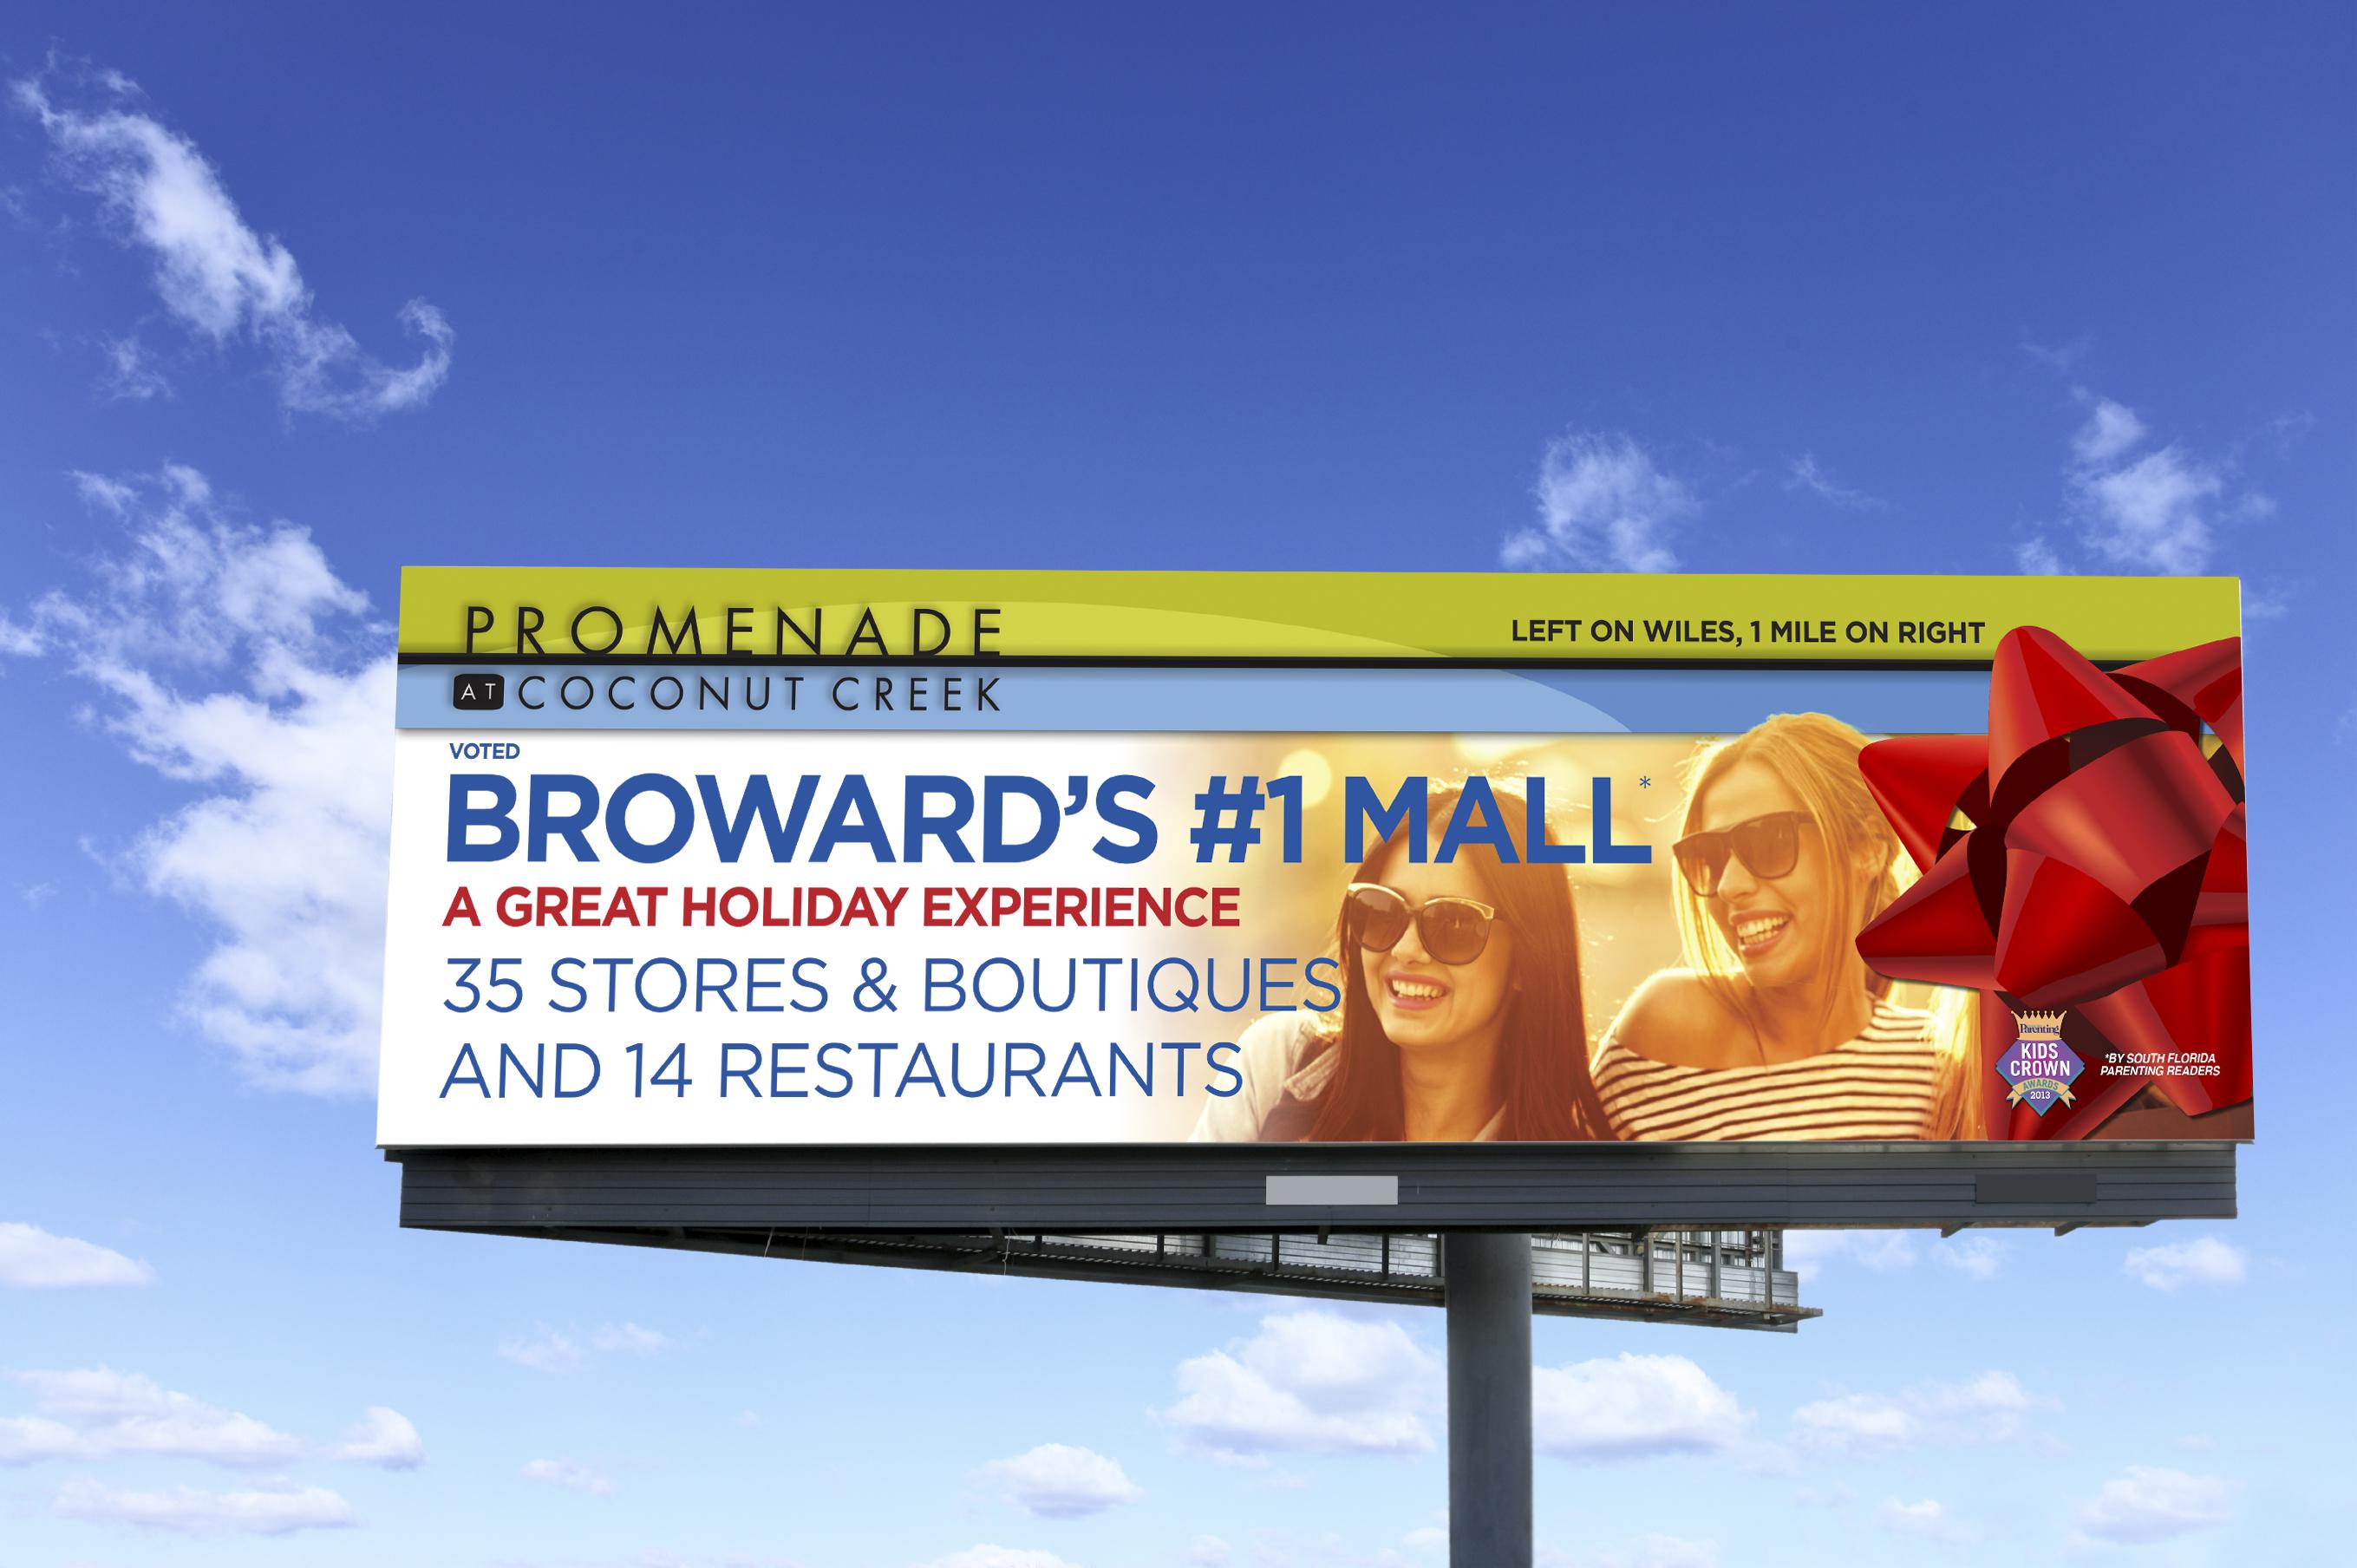 Promenade Billboard 2